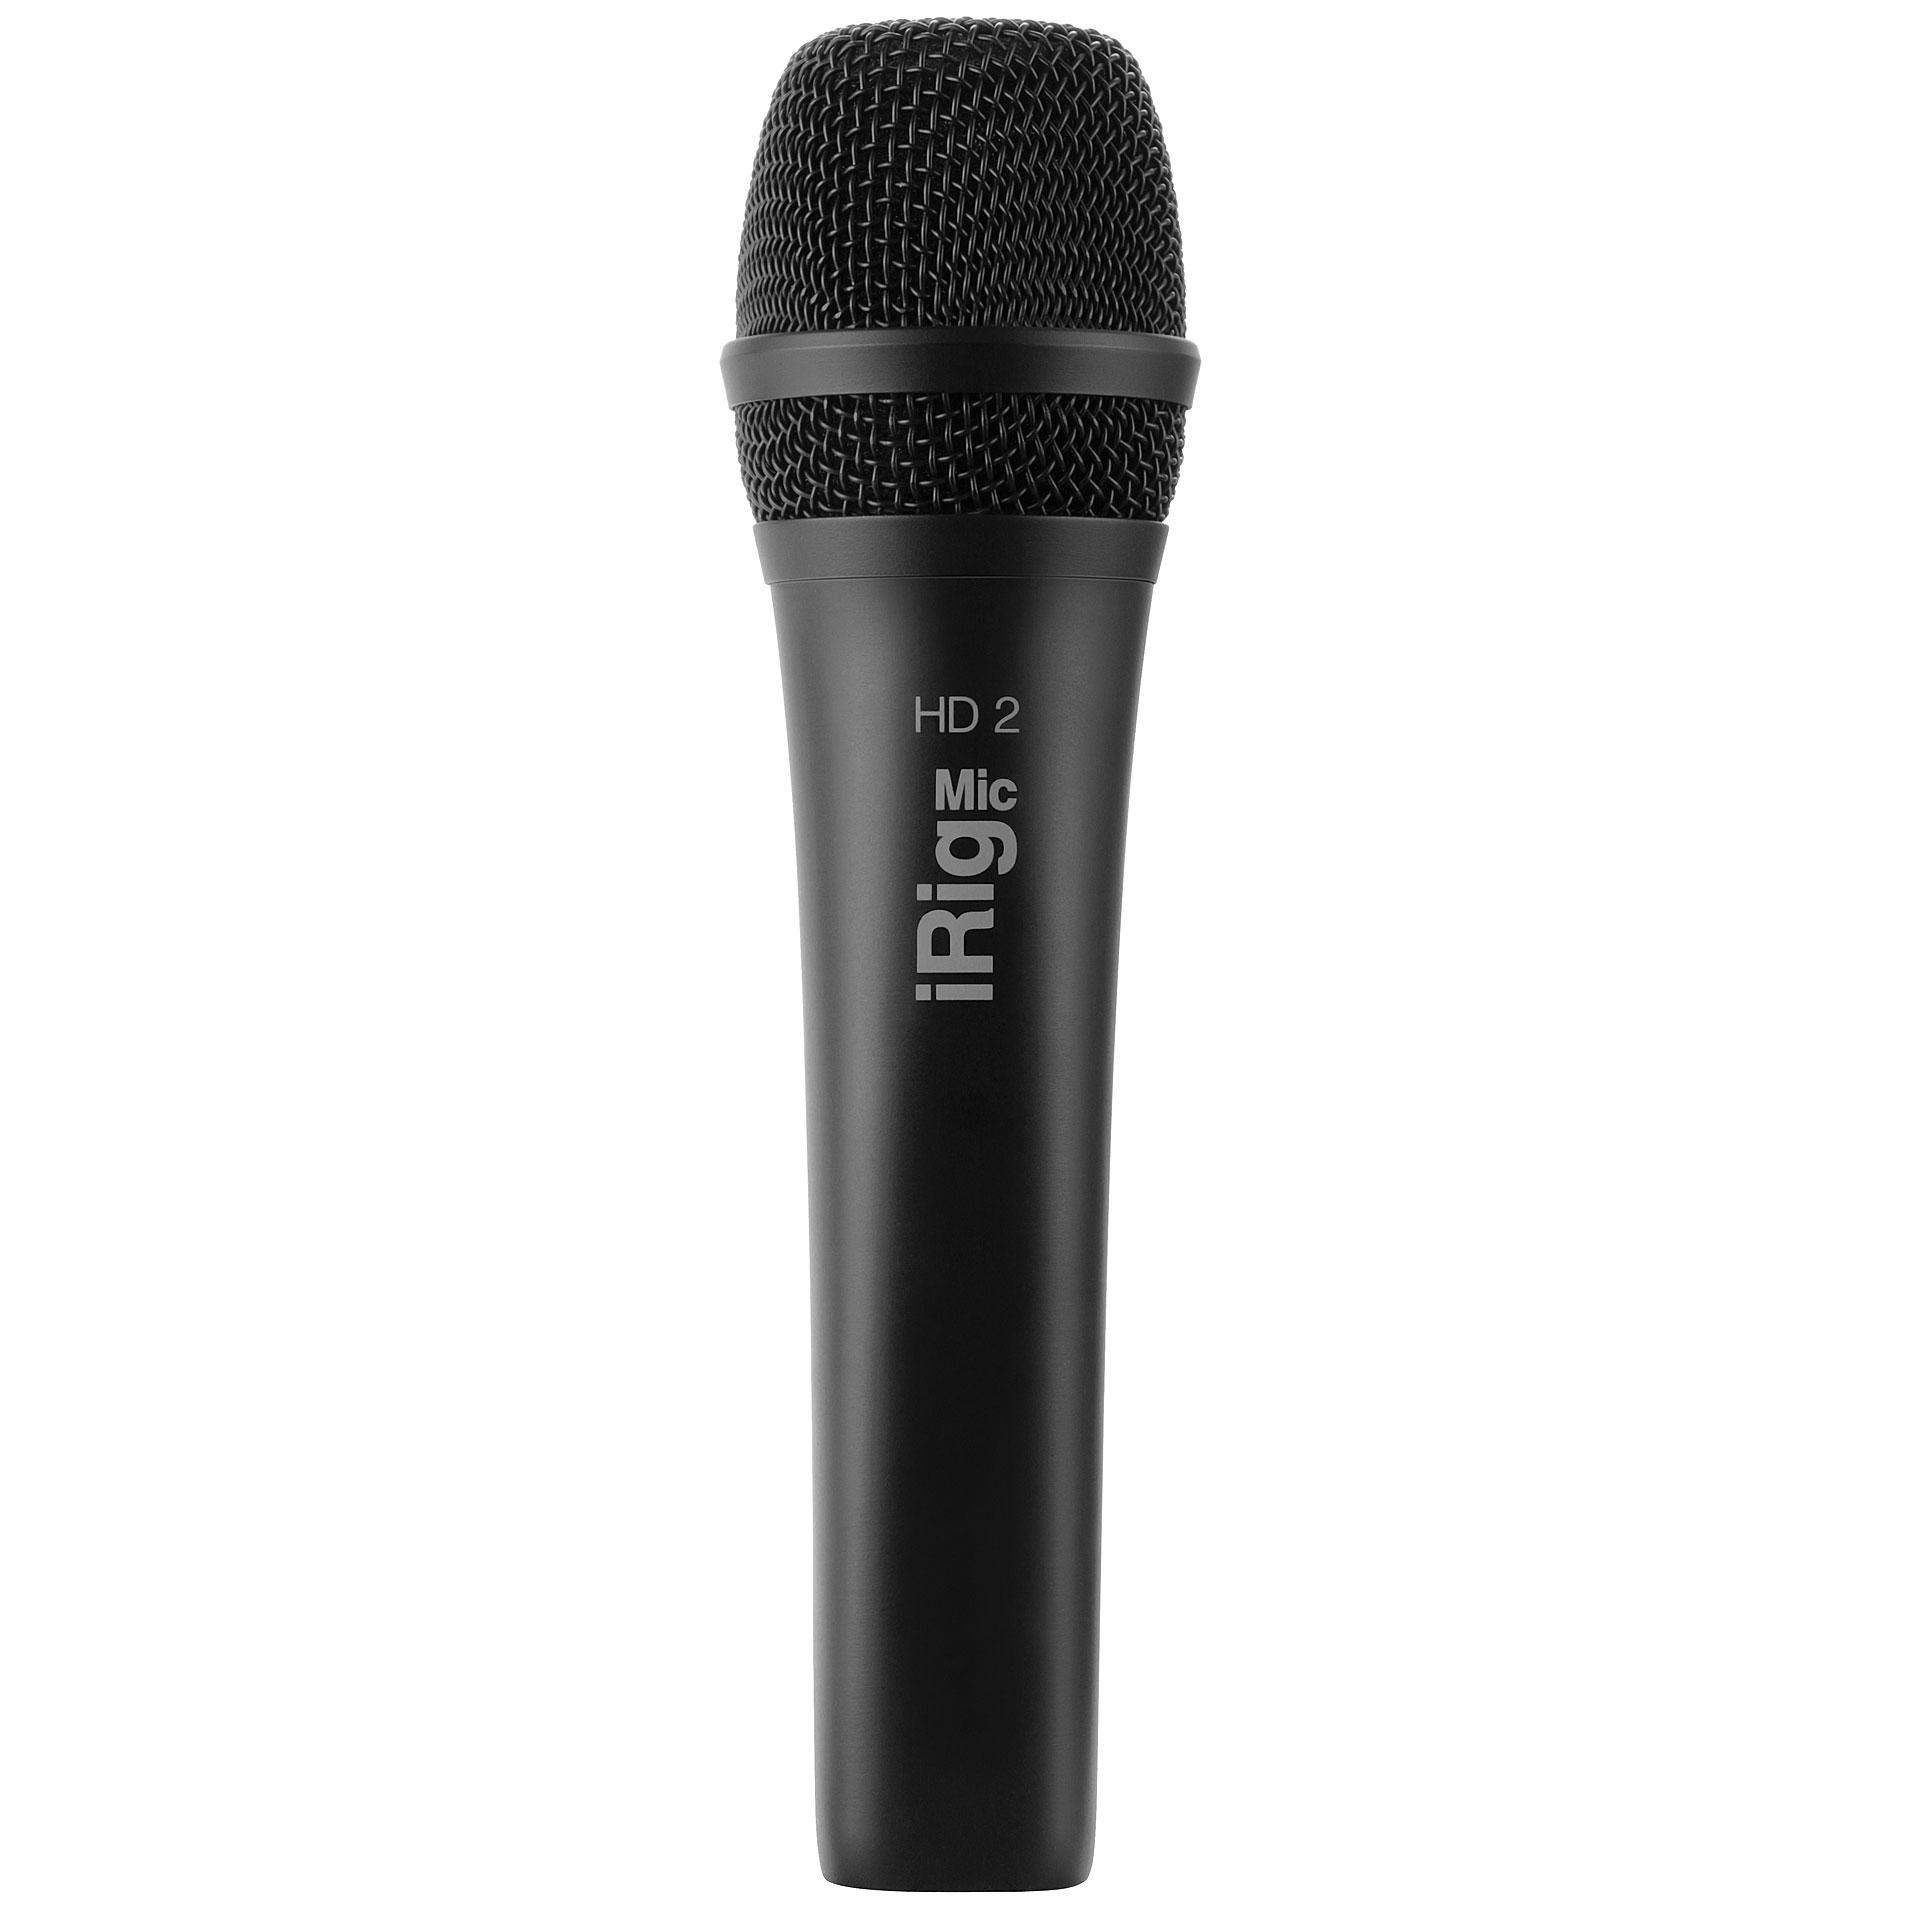 ik multimedia irig mic hd 2 microphone musik produktiv. Black Bedroom Furniture Sets. Home Design Ideas